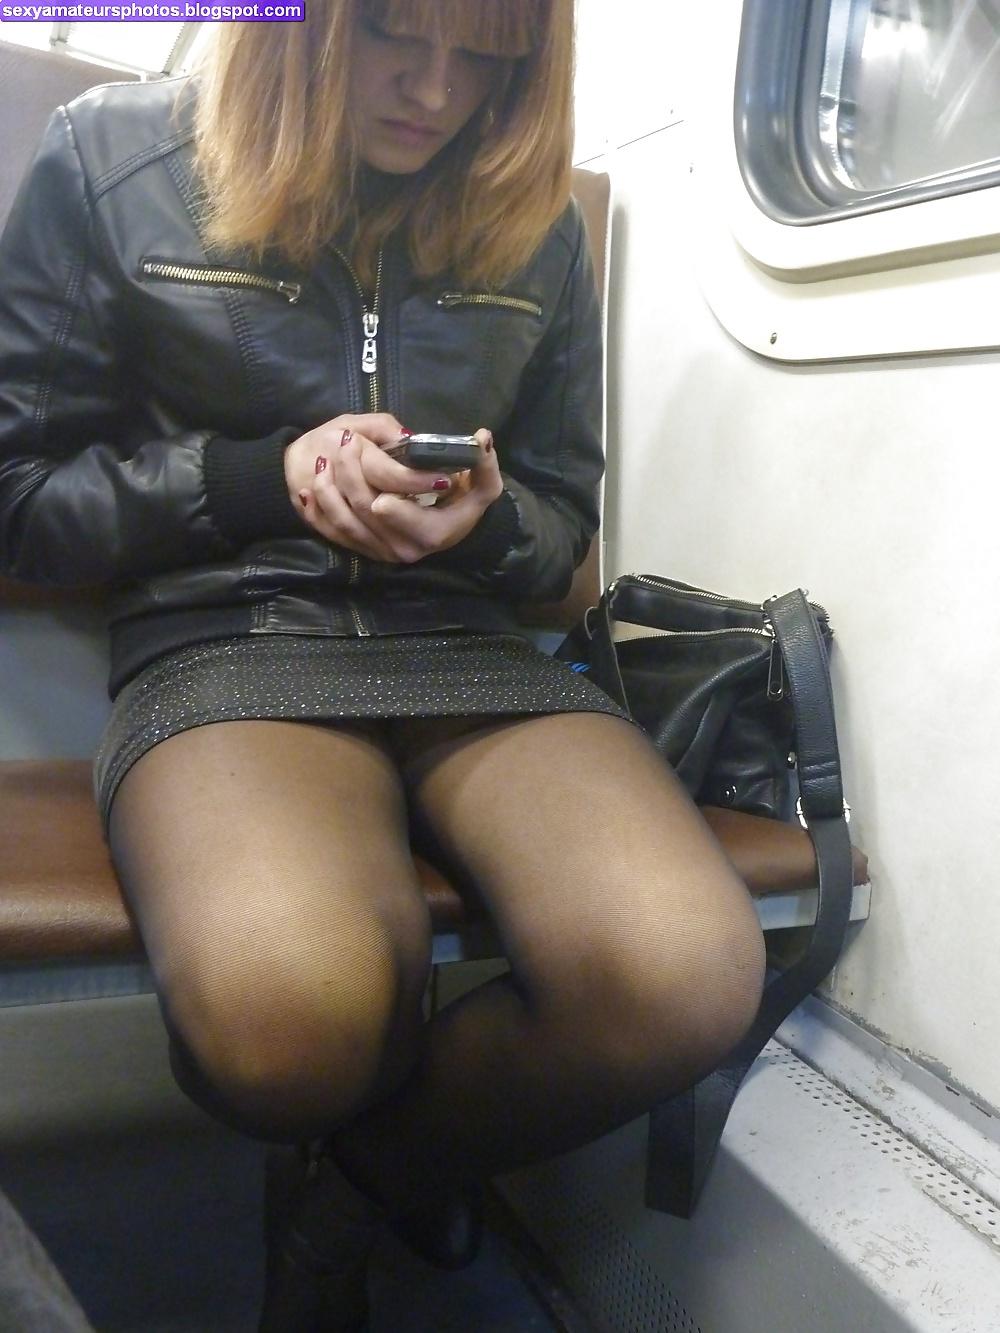 Лезут под юбку в транспорте